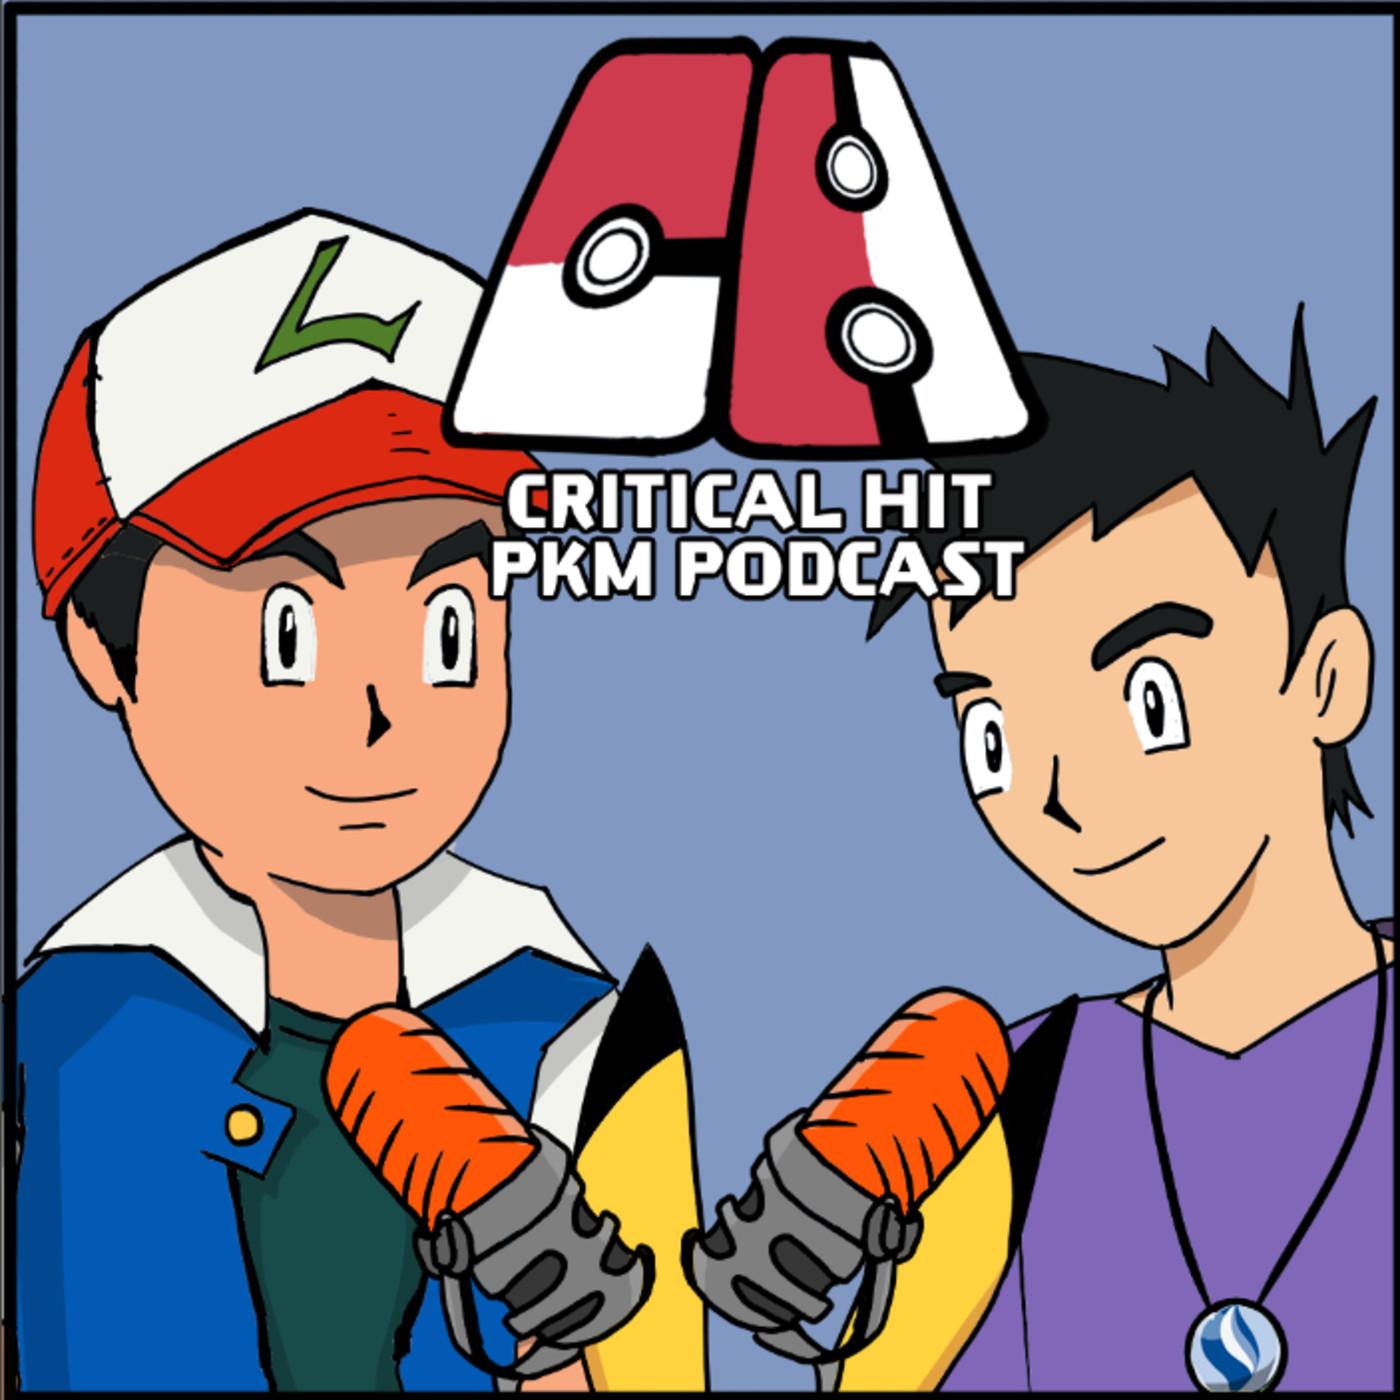 14. Critical Hit Pokemon Podcast. La tercera Generación